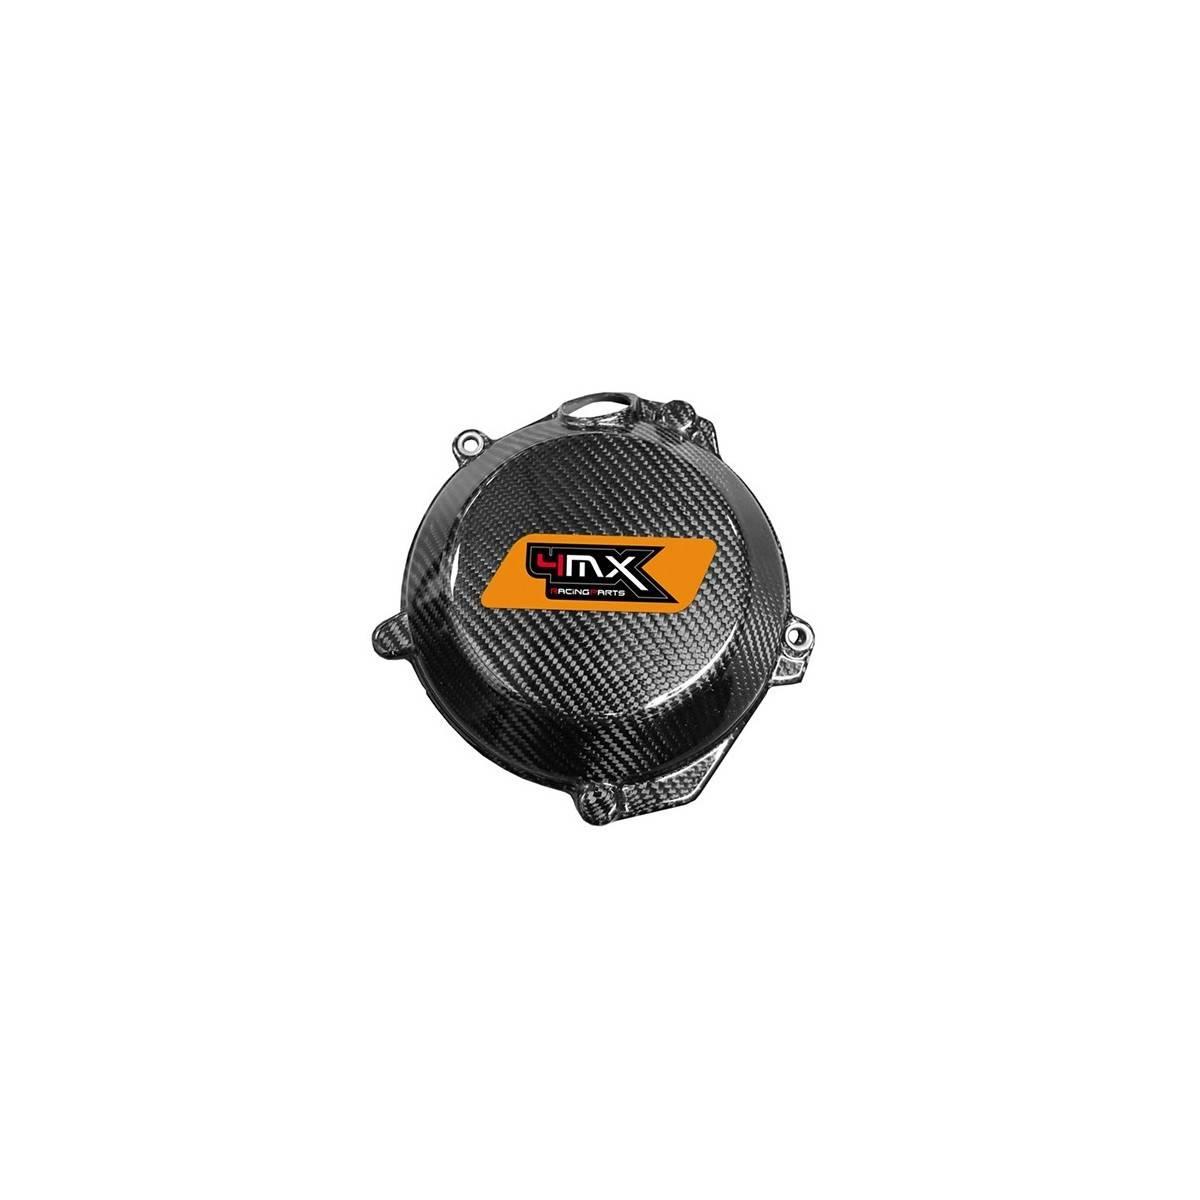 4MX22.02 - Protector Tapa Embrague Carbono Husqvarna Fe 250 350 Fc 250 350 14 16